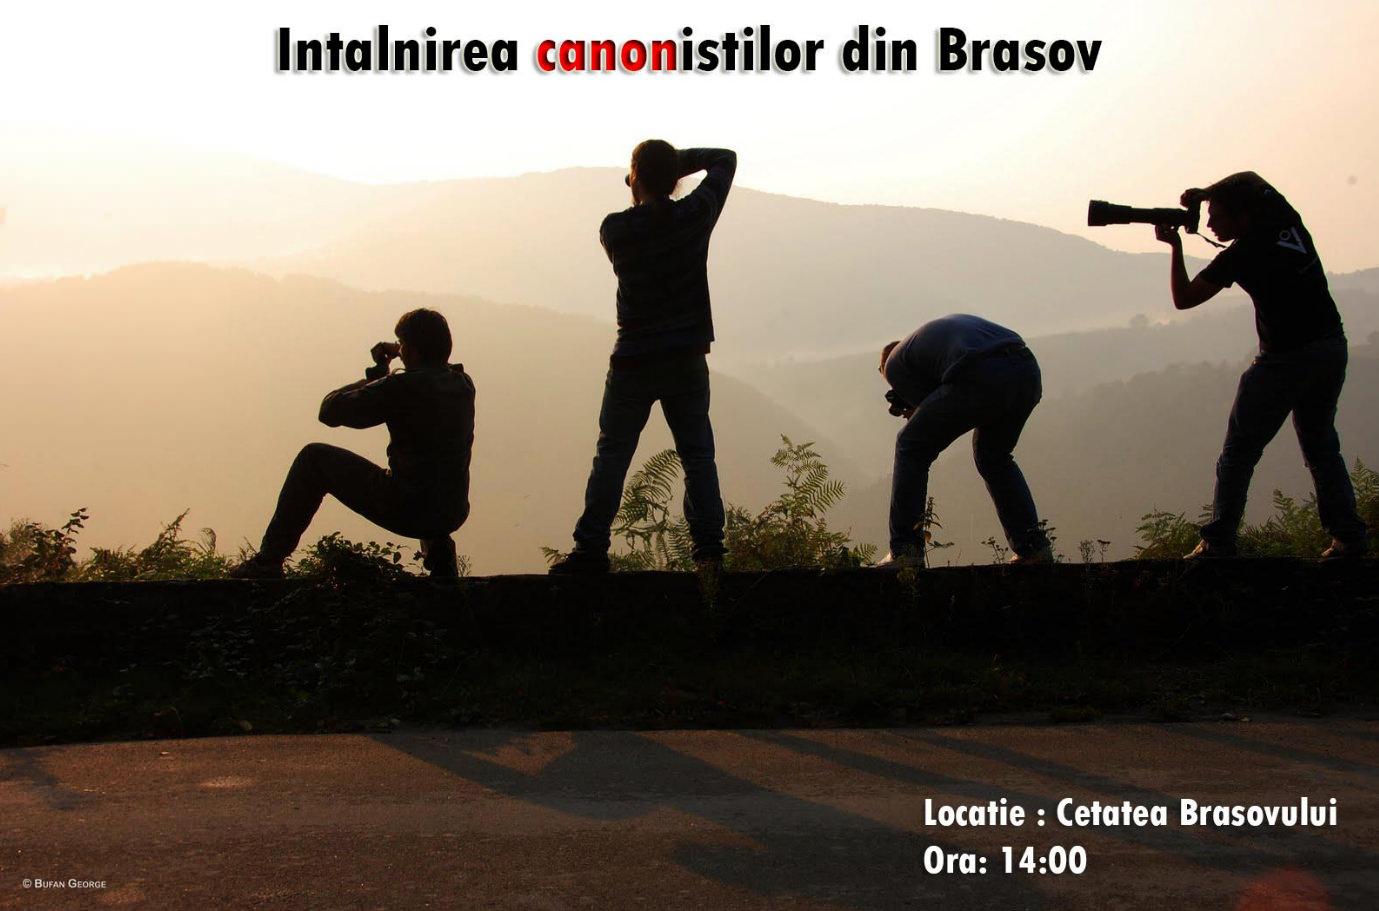 2011.11.10-Canonisti-Brasov